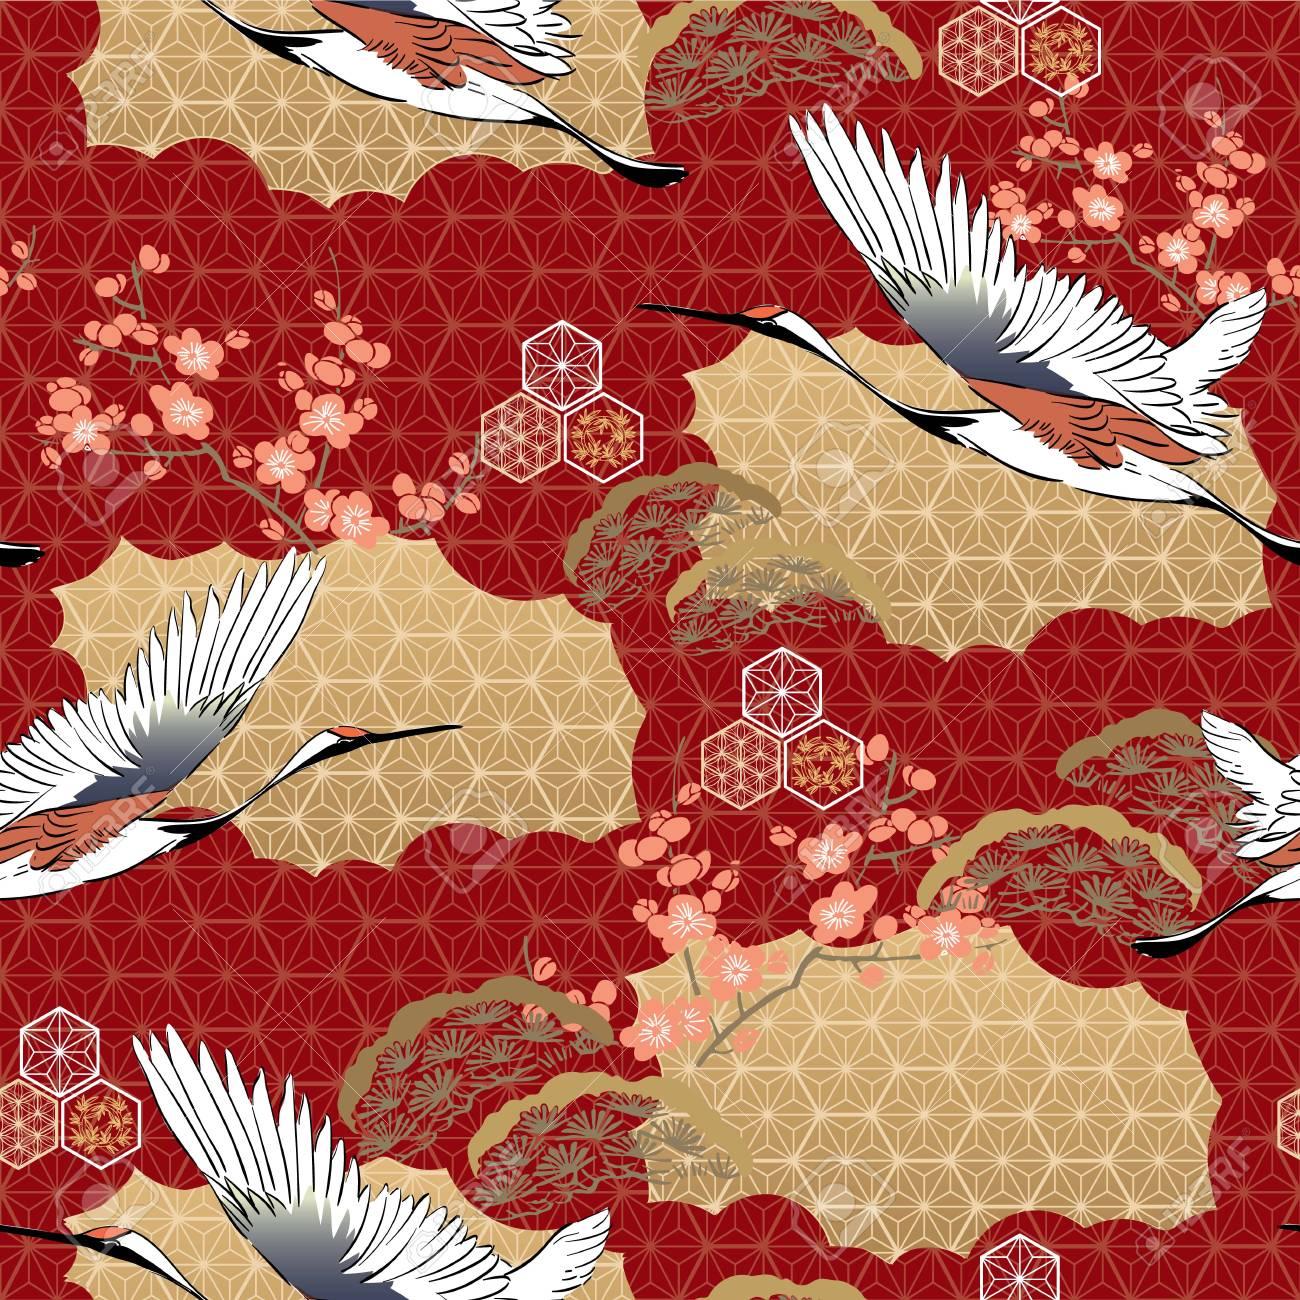 Japanese Kimono Pattern Cherry Blossom Crane Birds Pine Tree Royalty Free Cliparts Vectors And Stock Illustration Image 120809484